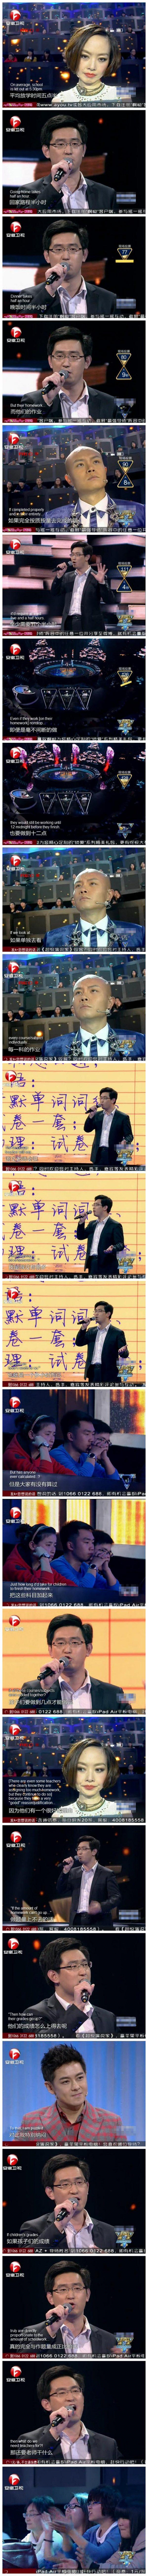 china-tv-speech-on-homework-translated